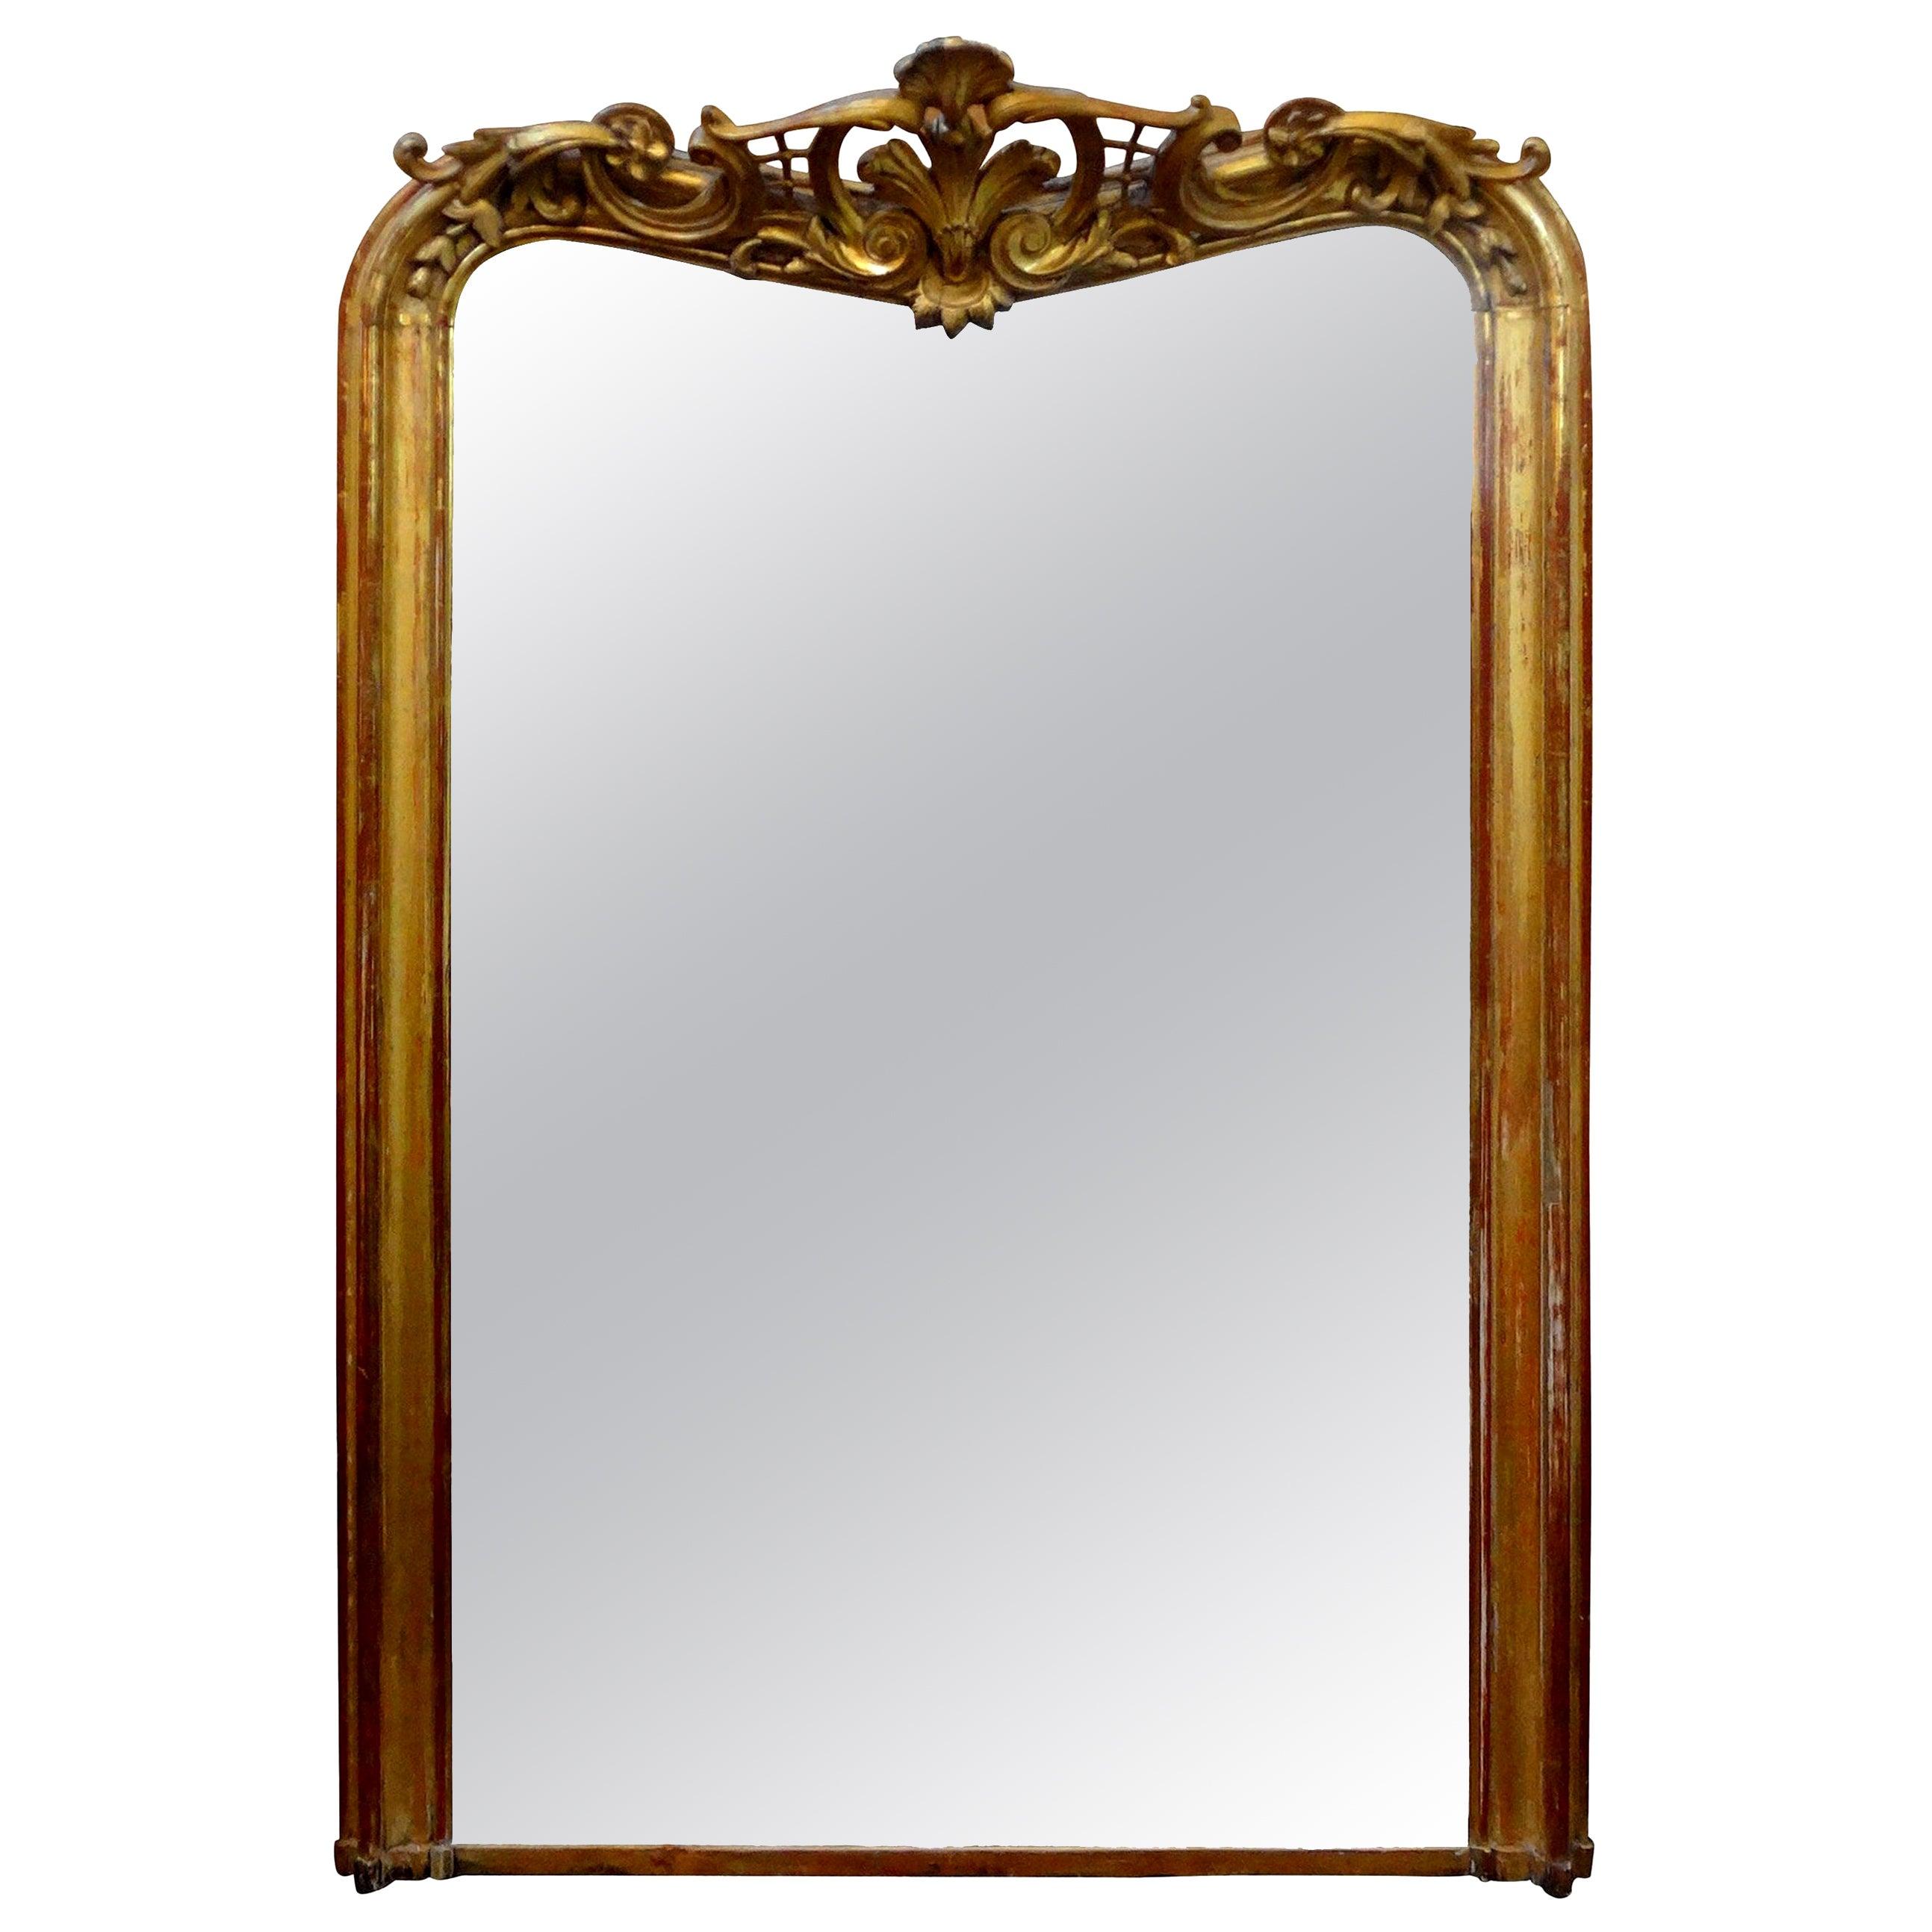 19th Century French Louis XV Style Giltwood Mirror